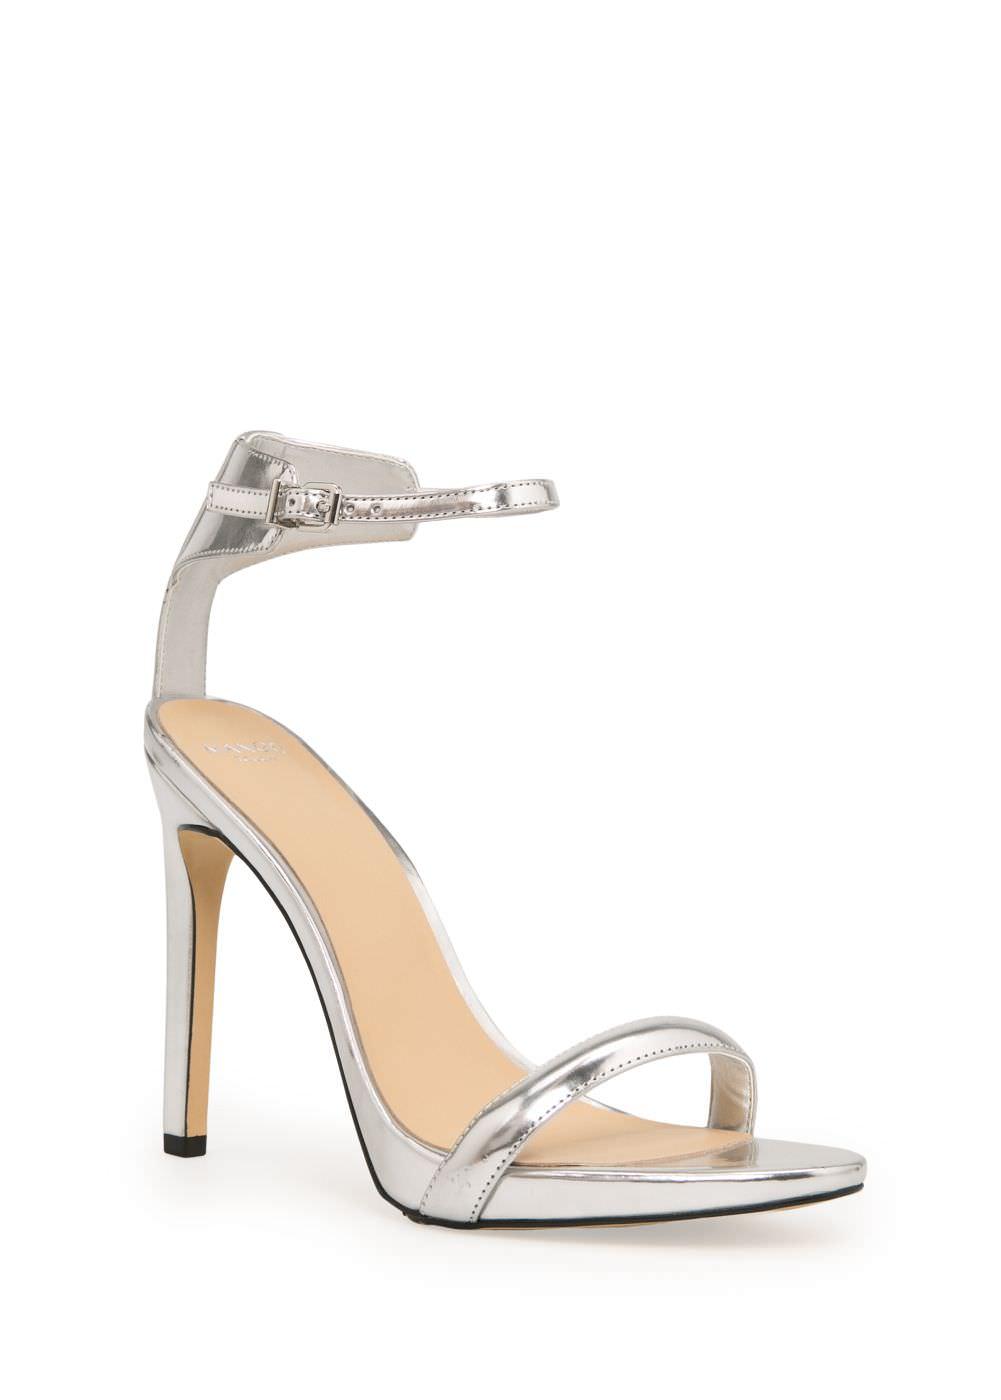 Sandalen met stilettohakken -  Schoenen - Dames - MANGO